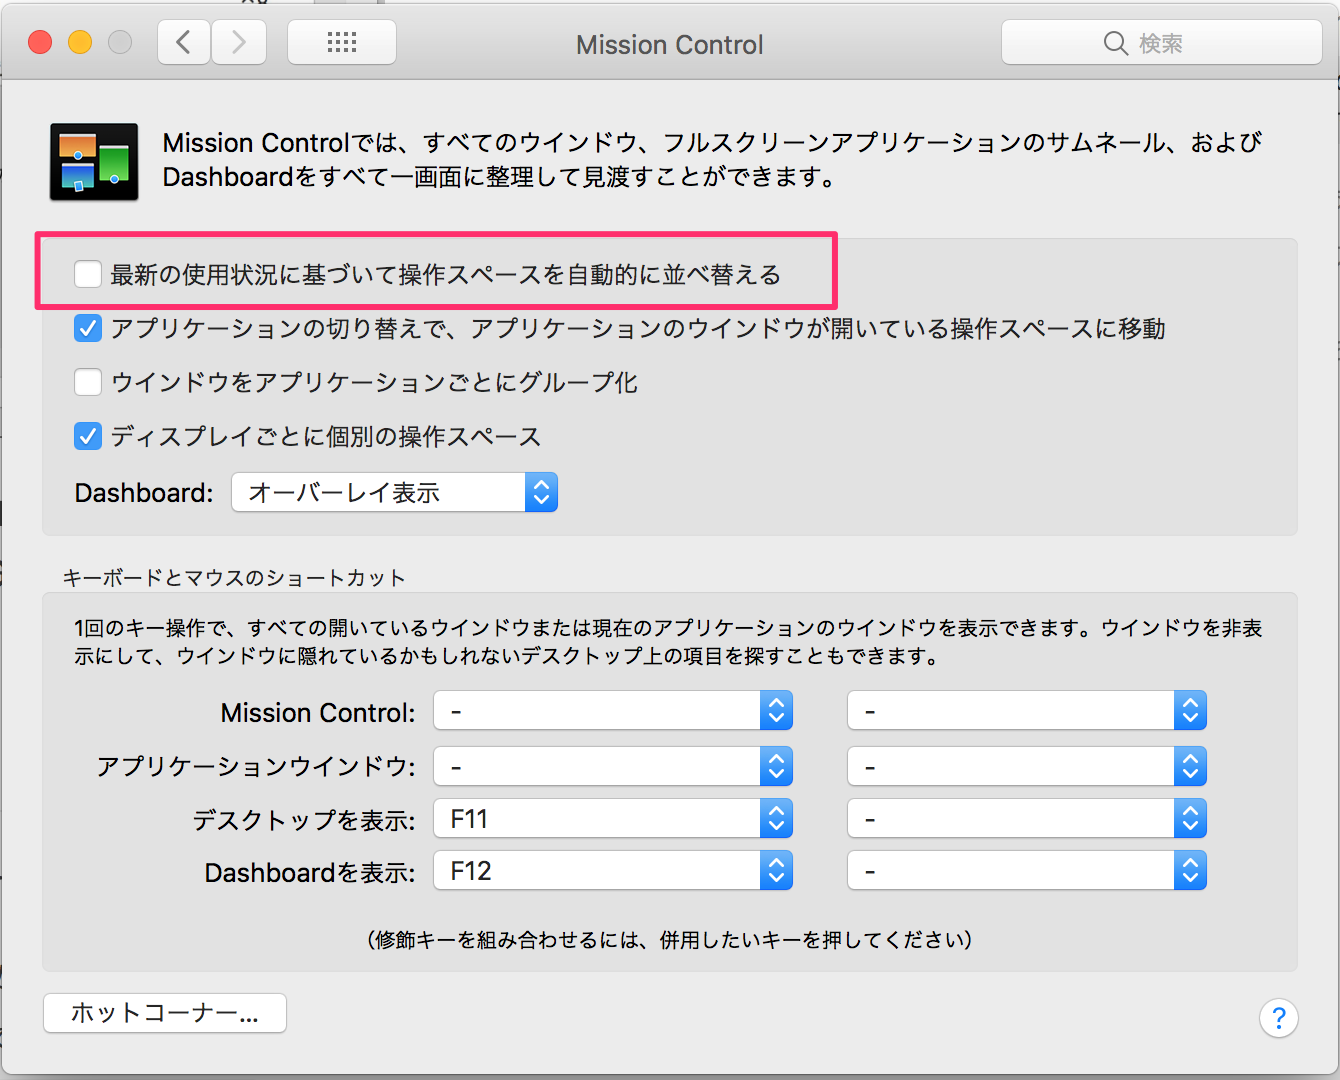 Mission_Control_と_macOSでディスプレイ1枚で作業する技術_-_Qiita.png